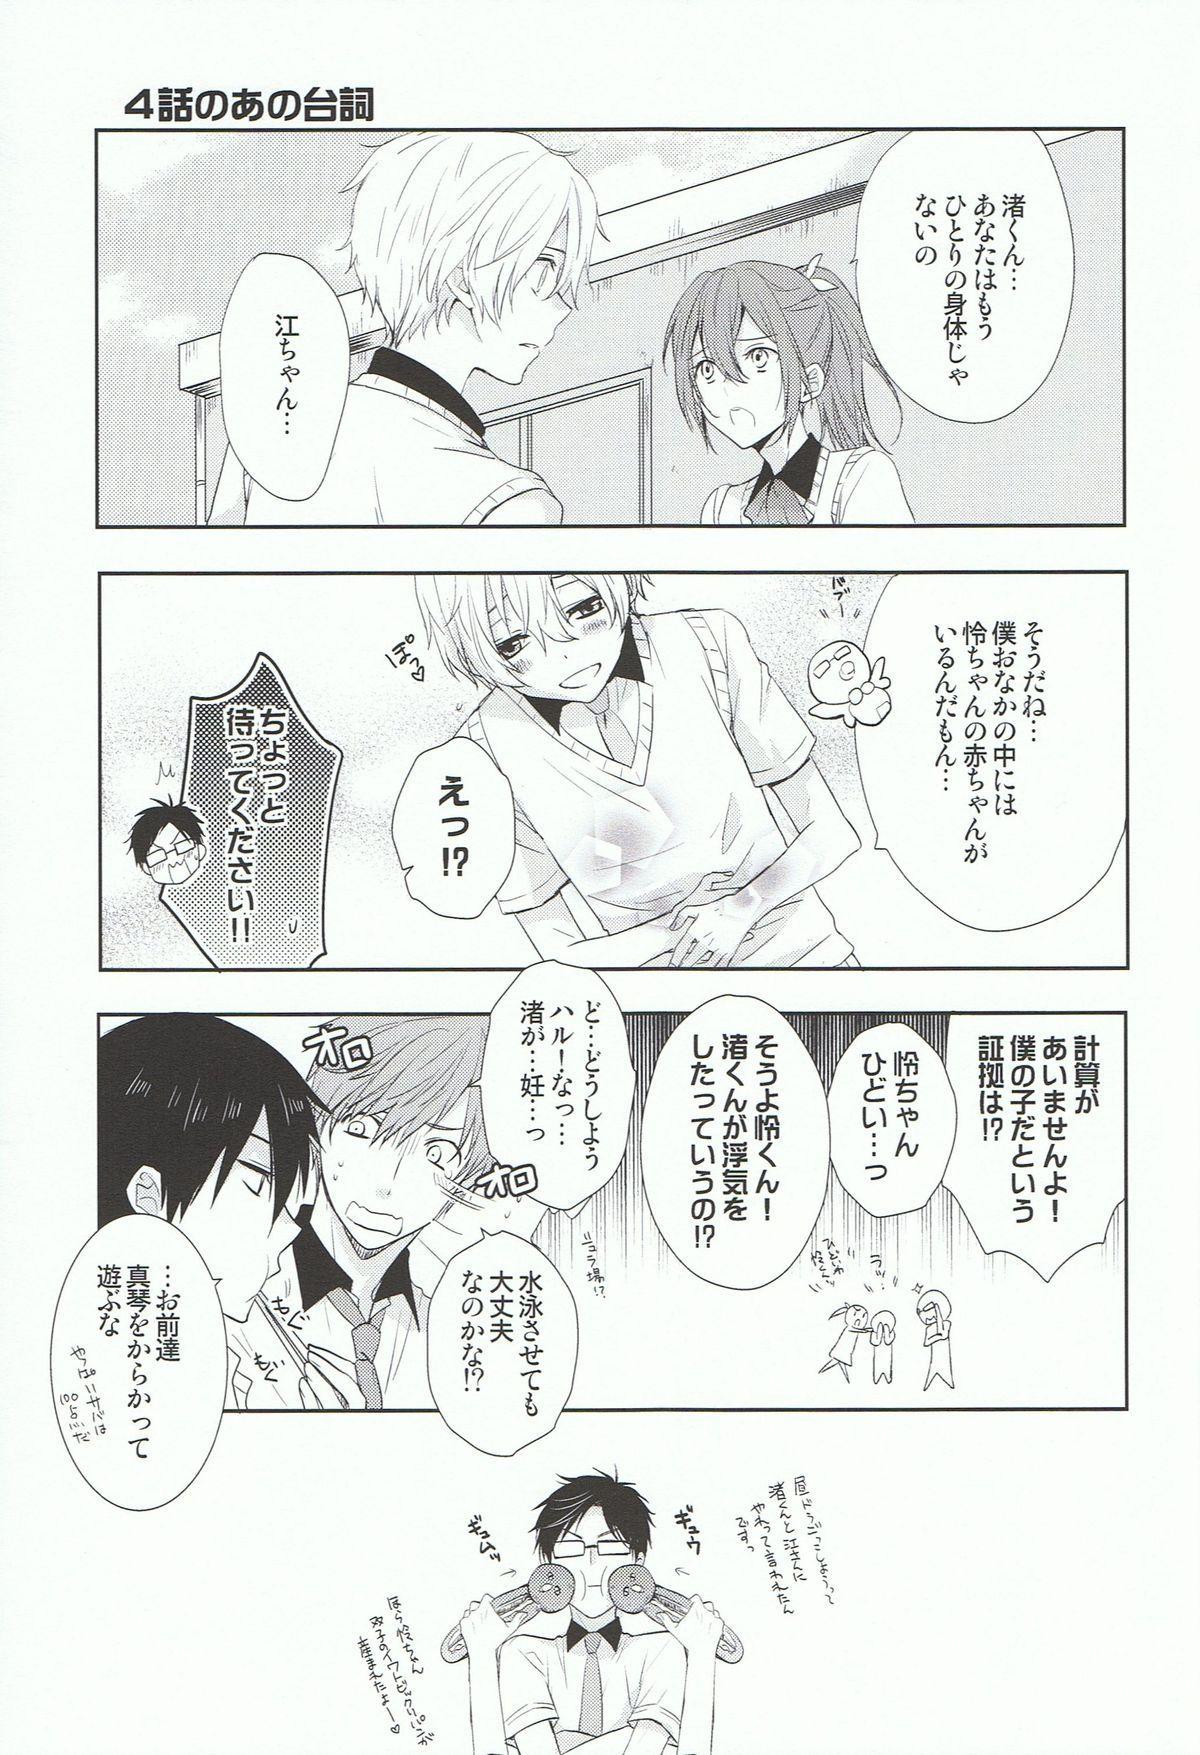 Nagisa-kun de ii deshou! 9